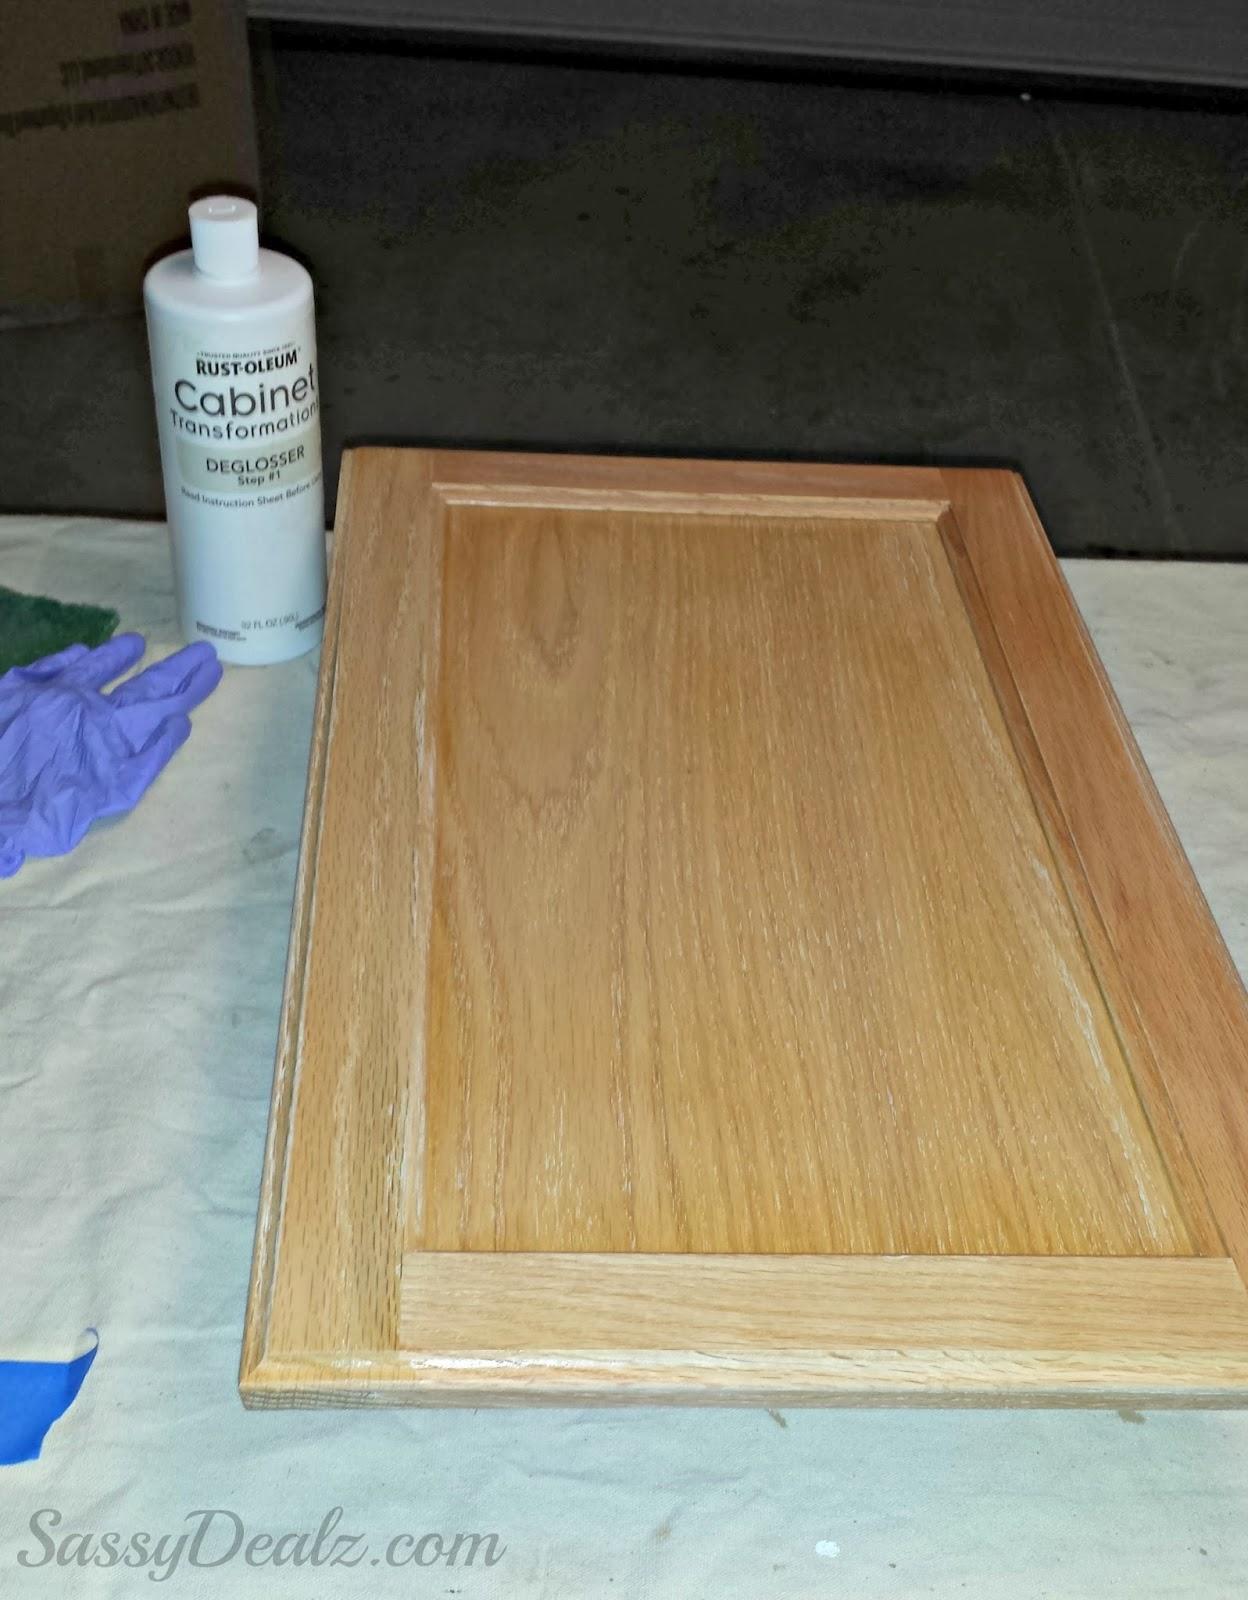 Rustoleum Cabinet Transformations Review Furniture Rug Cabinet Paint Lowes Cabinet Transformations